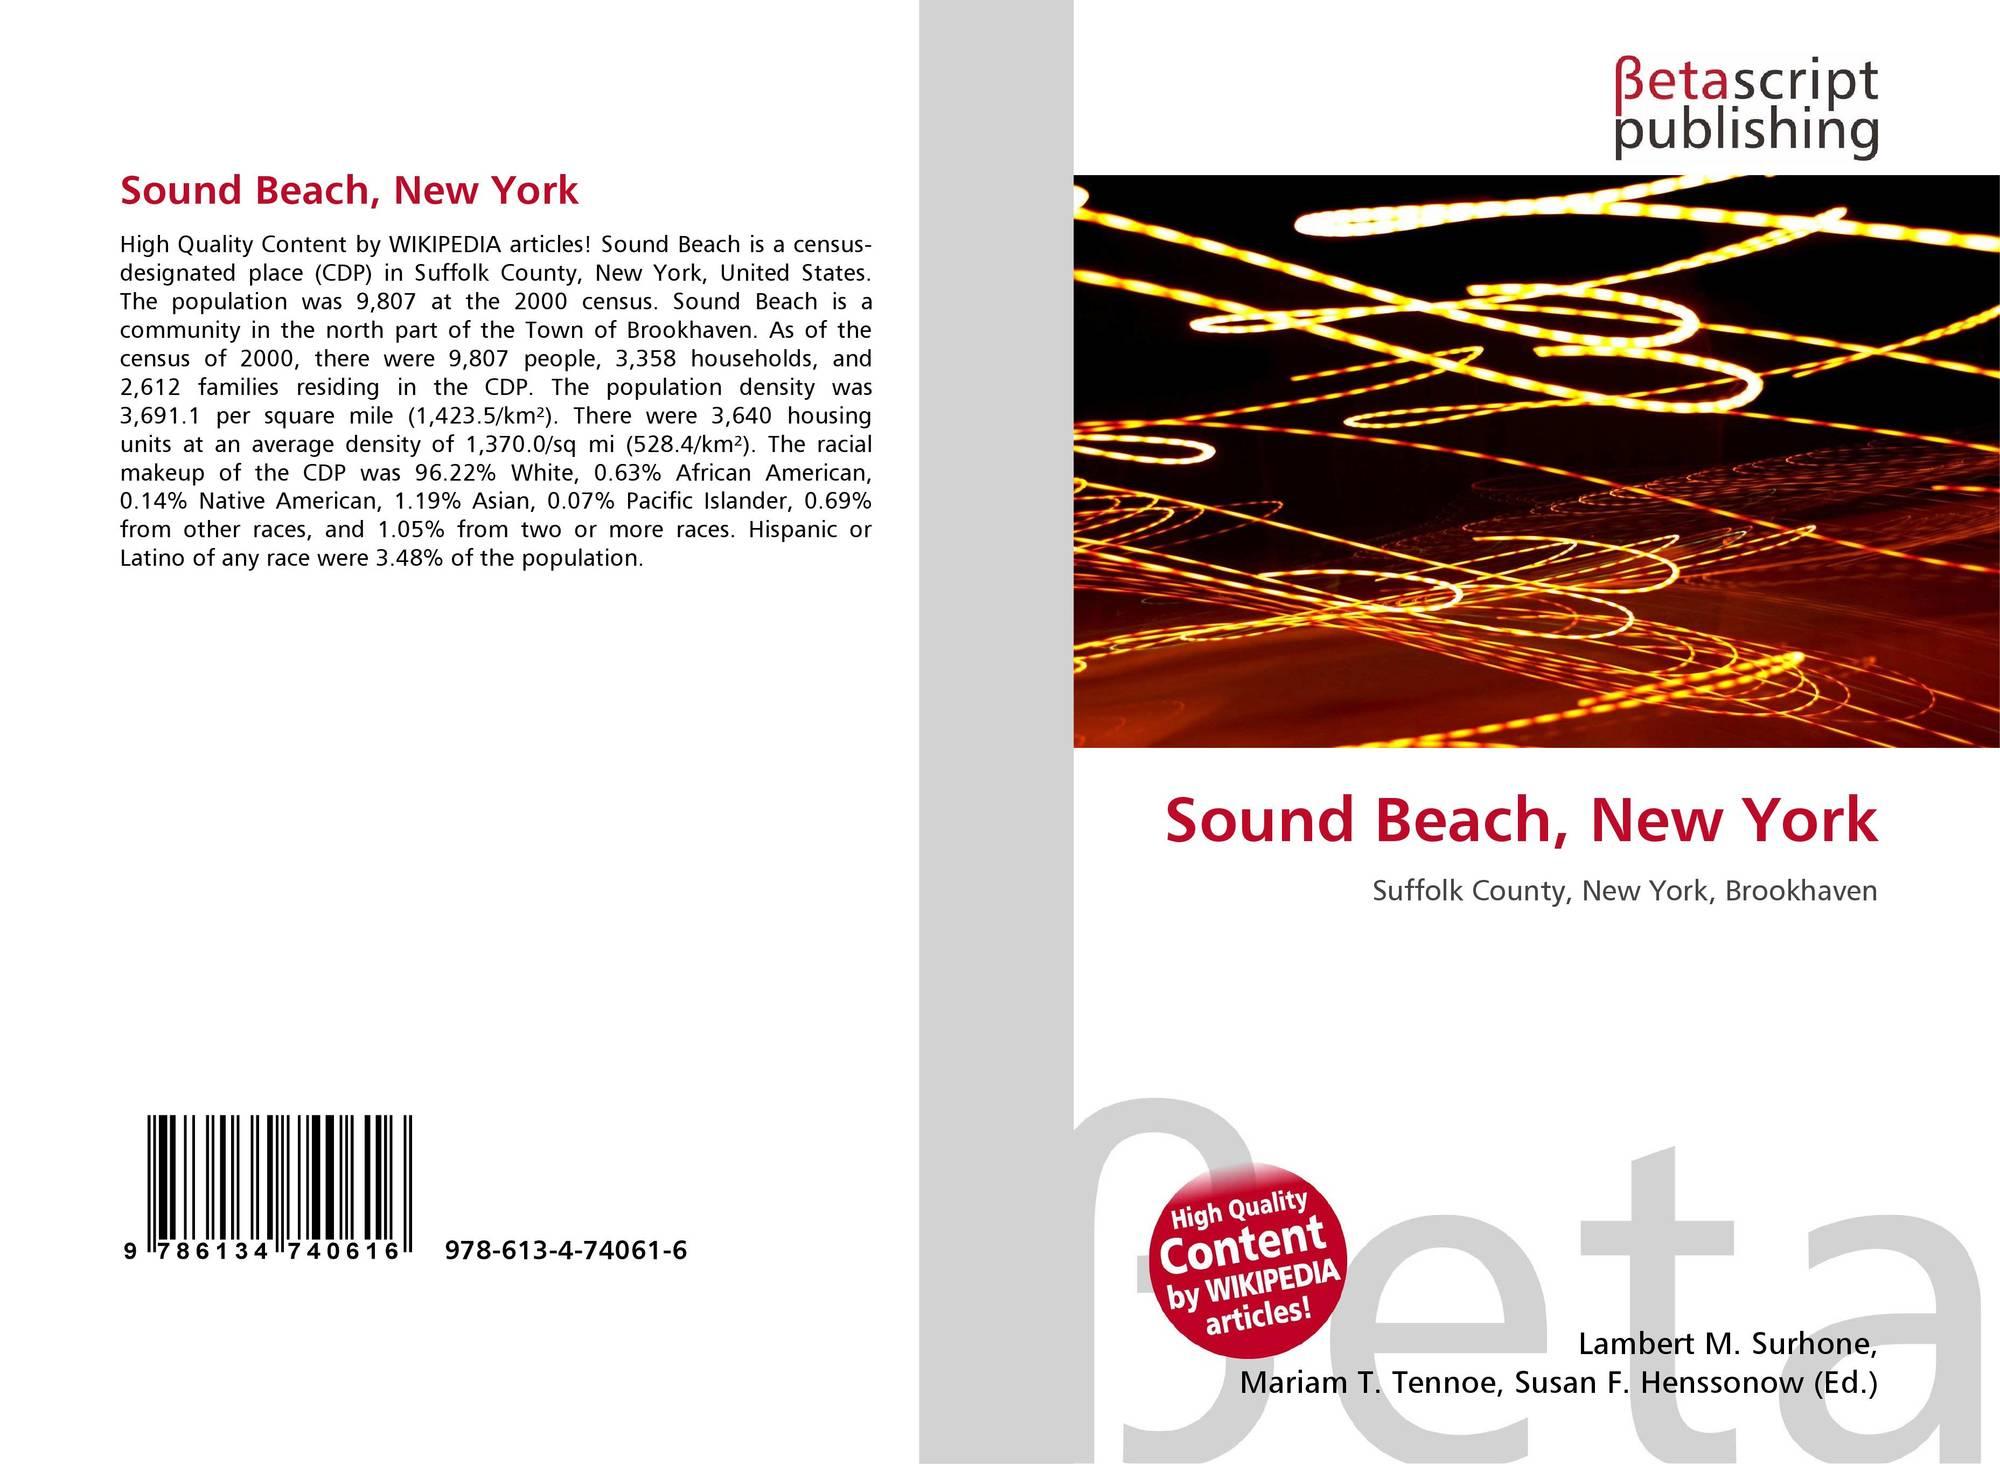 New york suffolk county sound beach - Bookcover Of Sound Beach New York